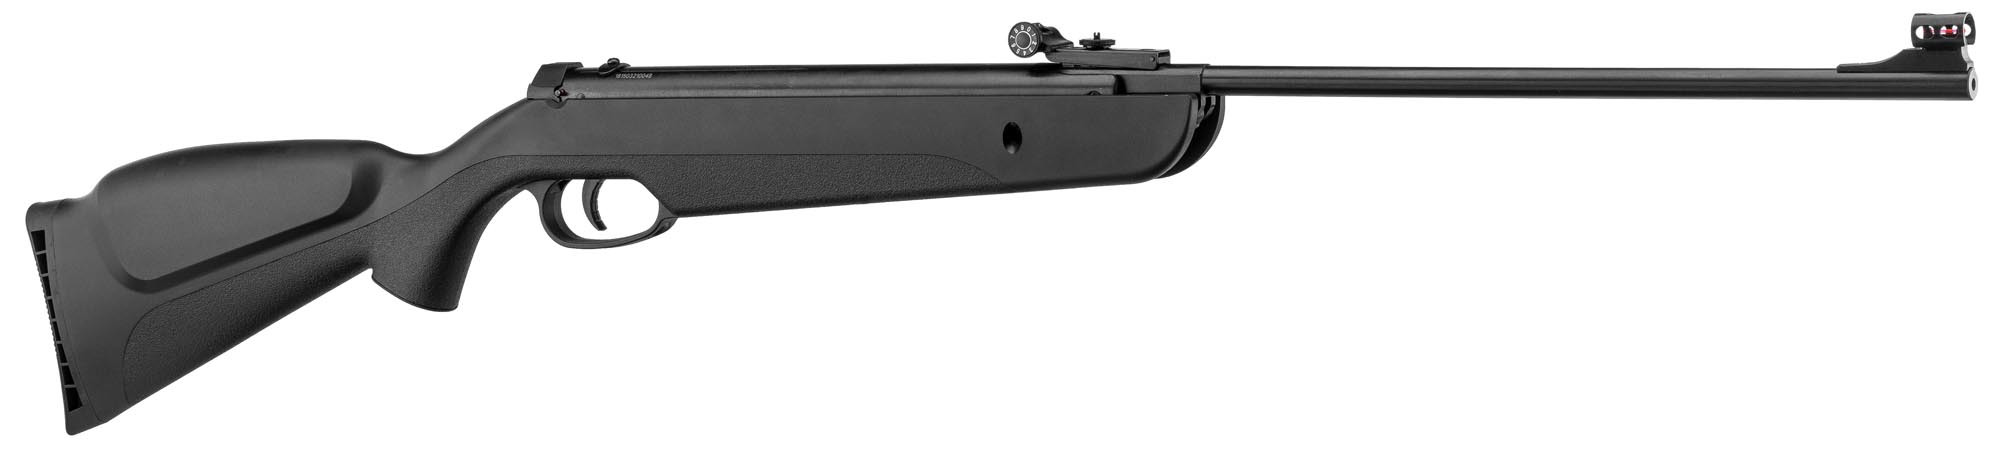 Carabine à plomb Beeman QB 22 avec lunette 4x20